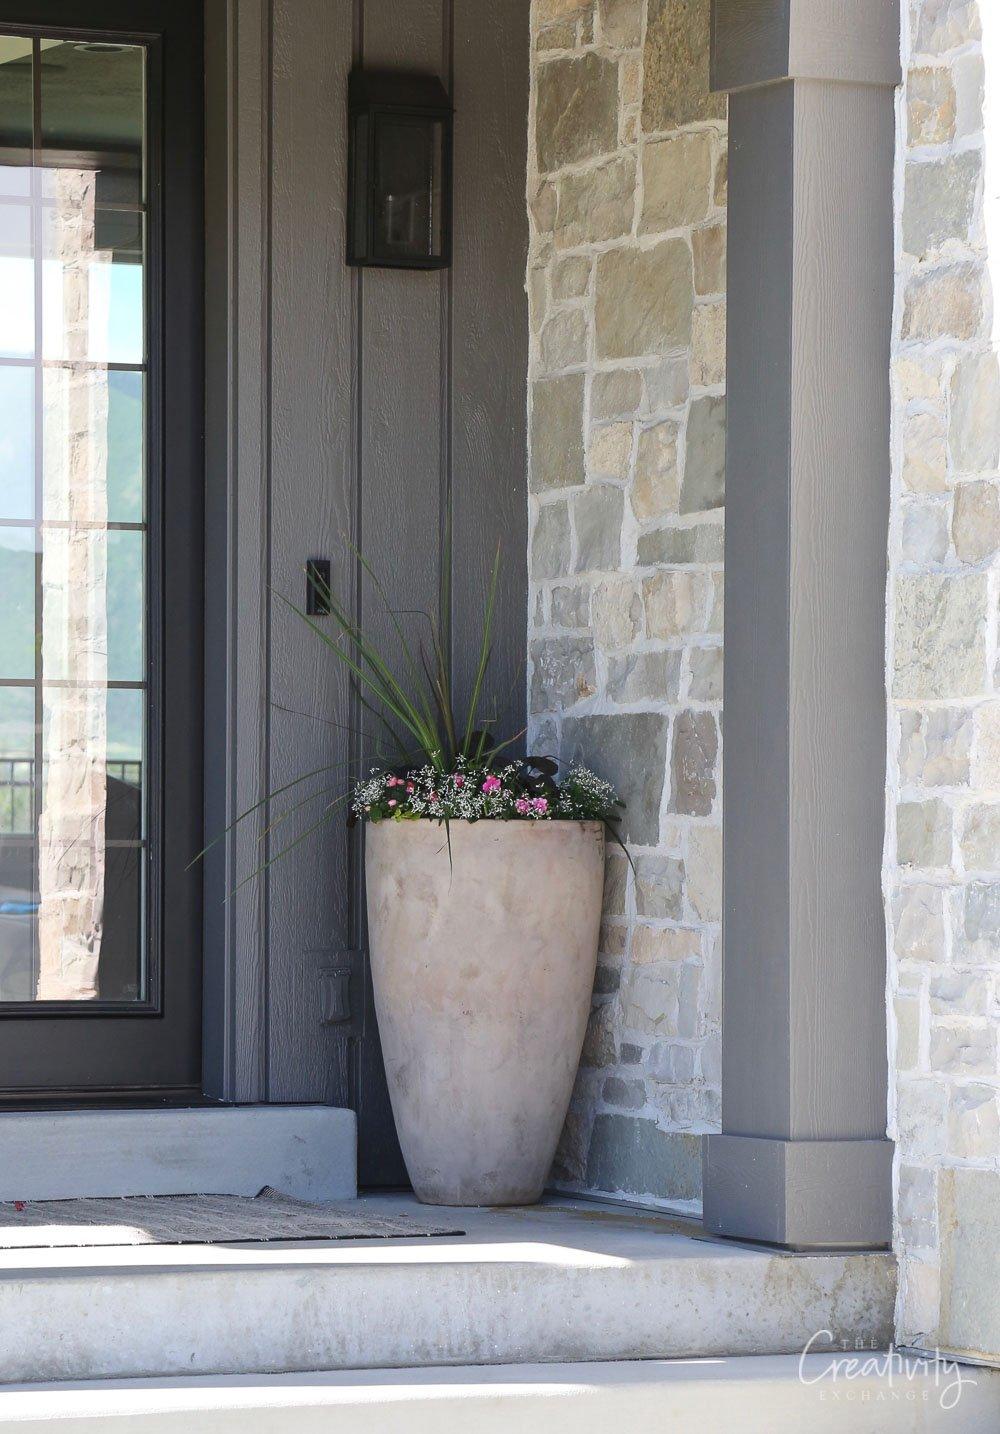 Planter on front porch exterior